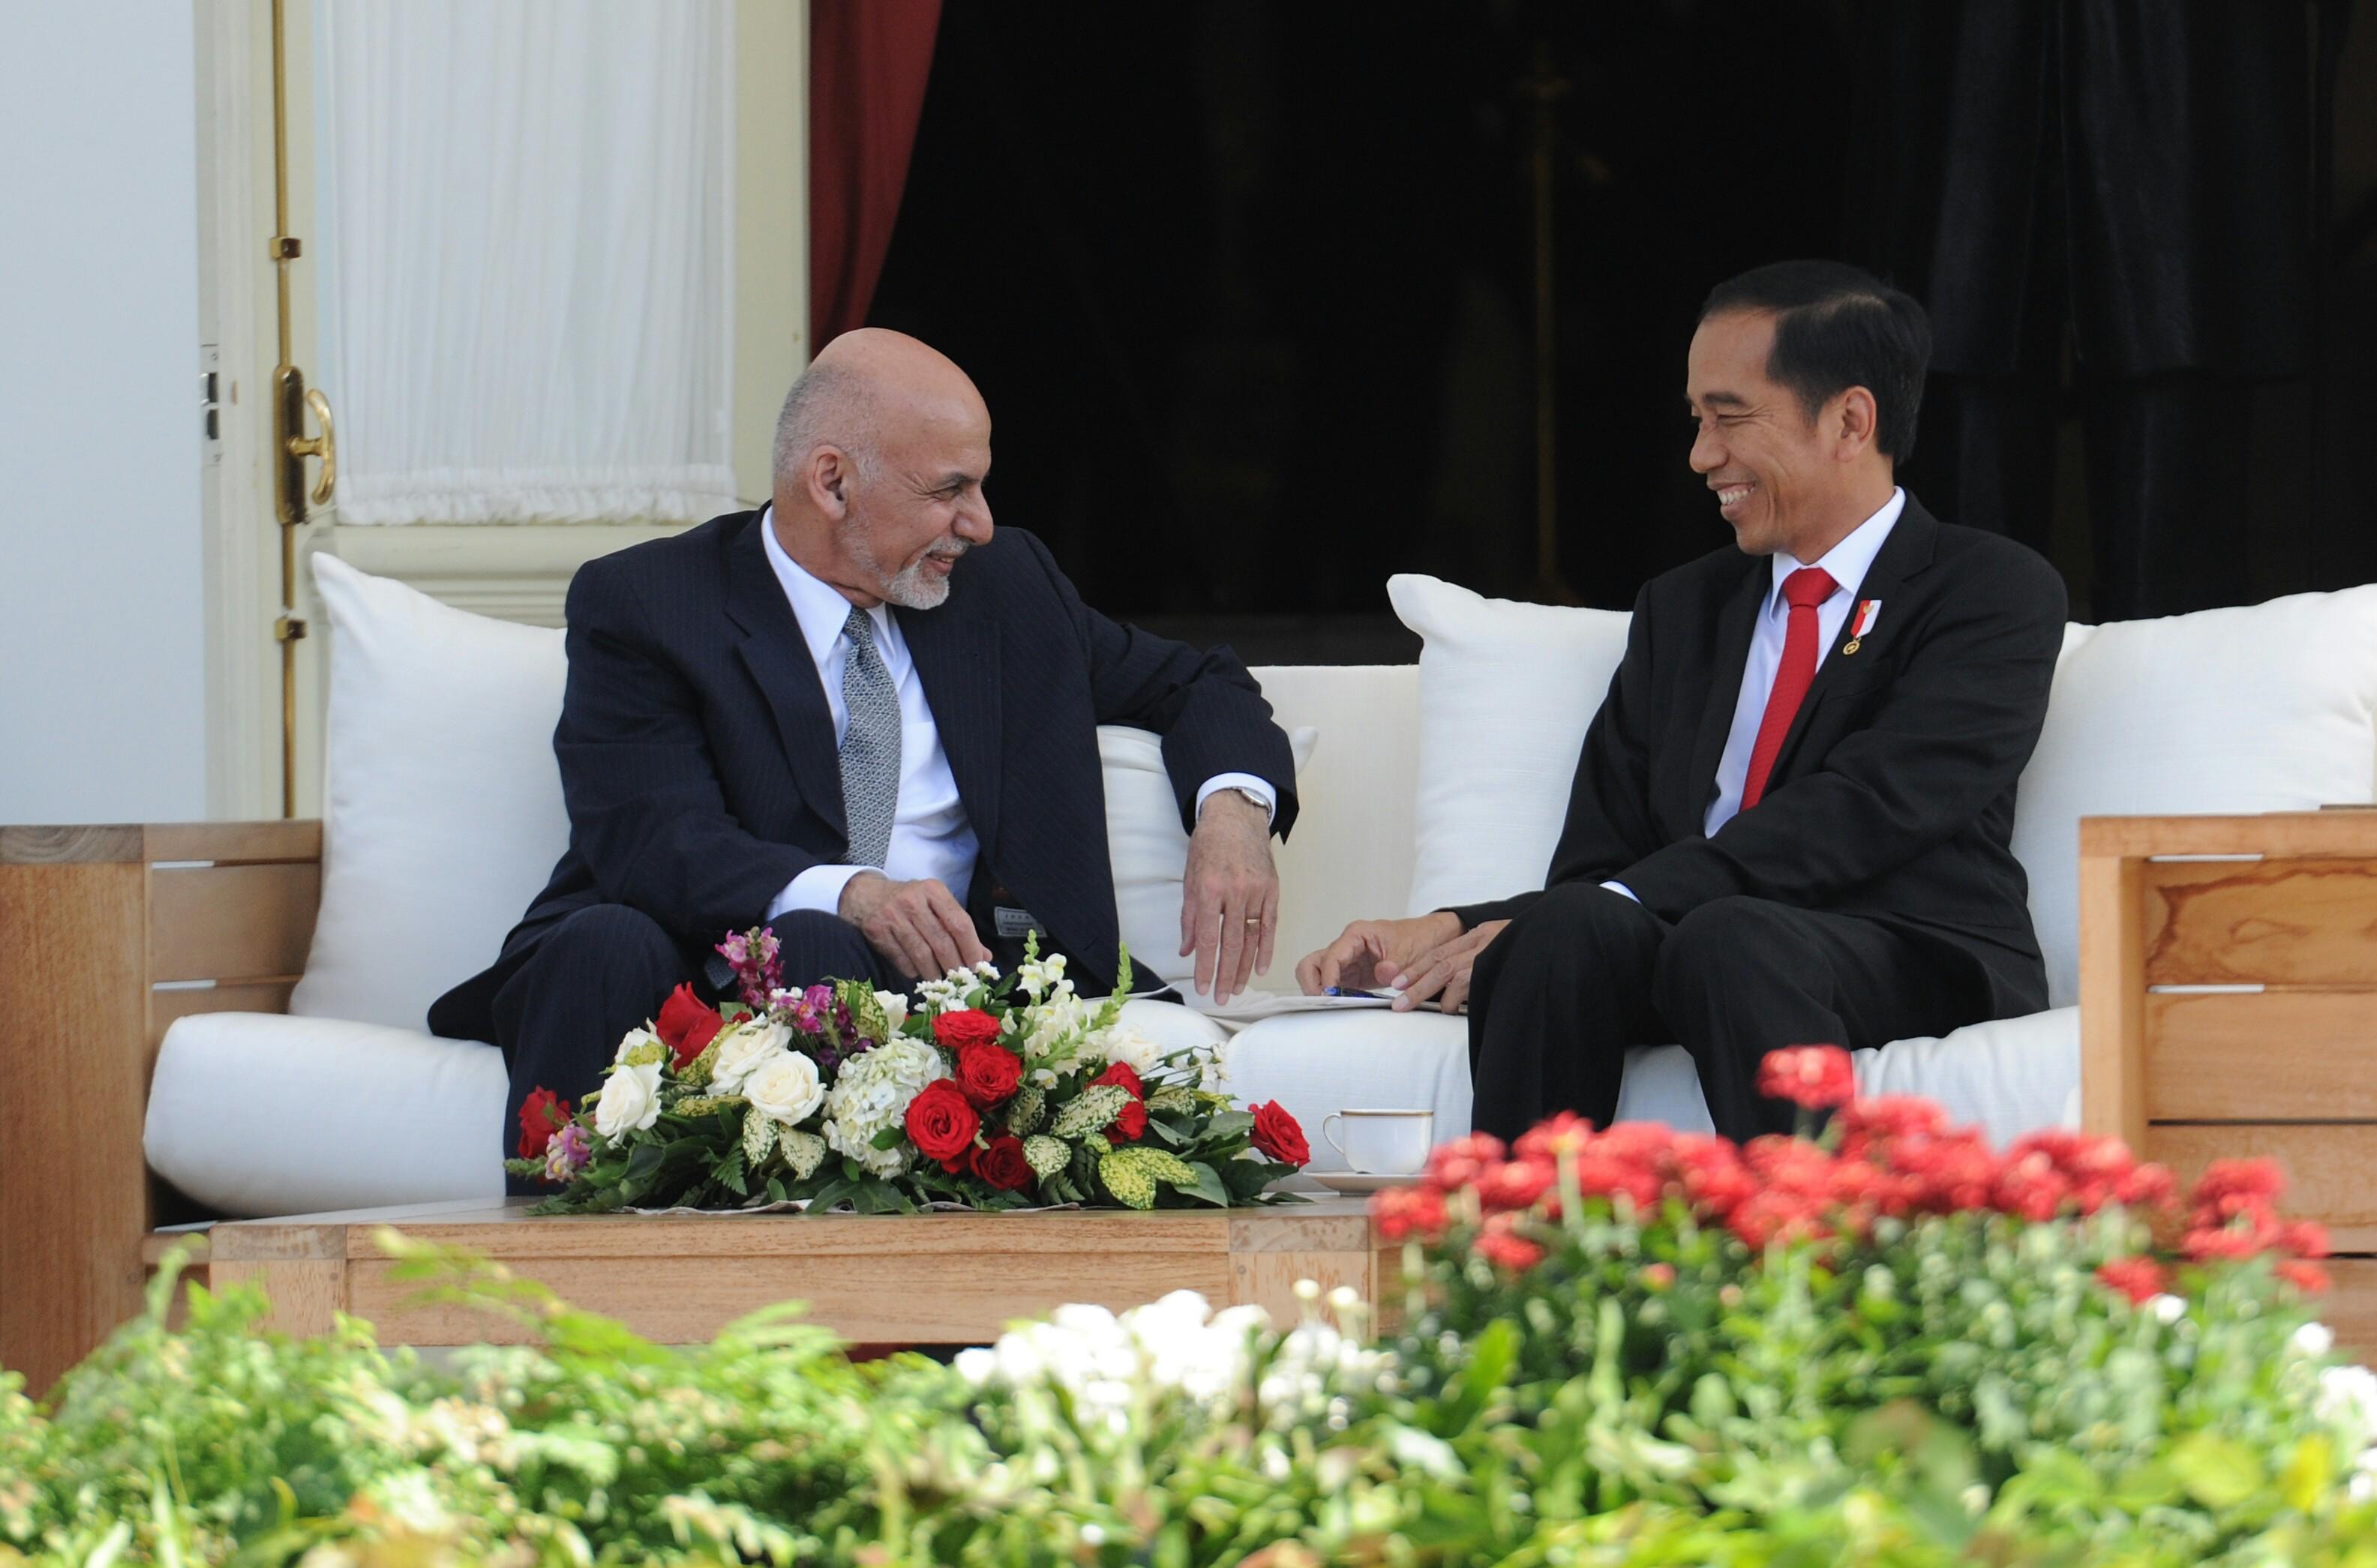 Presiden Jokowi berbincang akrab dengan Presiden Afghanistan Mohammad Ashraf Ghani sebelum pertemuan bilateral kedua negara, di Istana Merdeka, Jakarta, Rabu (5/4) sore. (Foto: Rahmat/Humas)